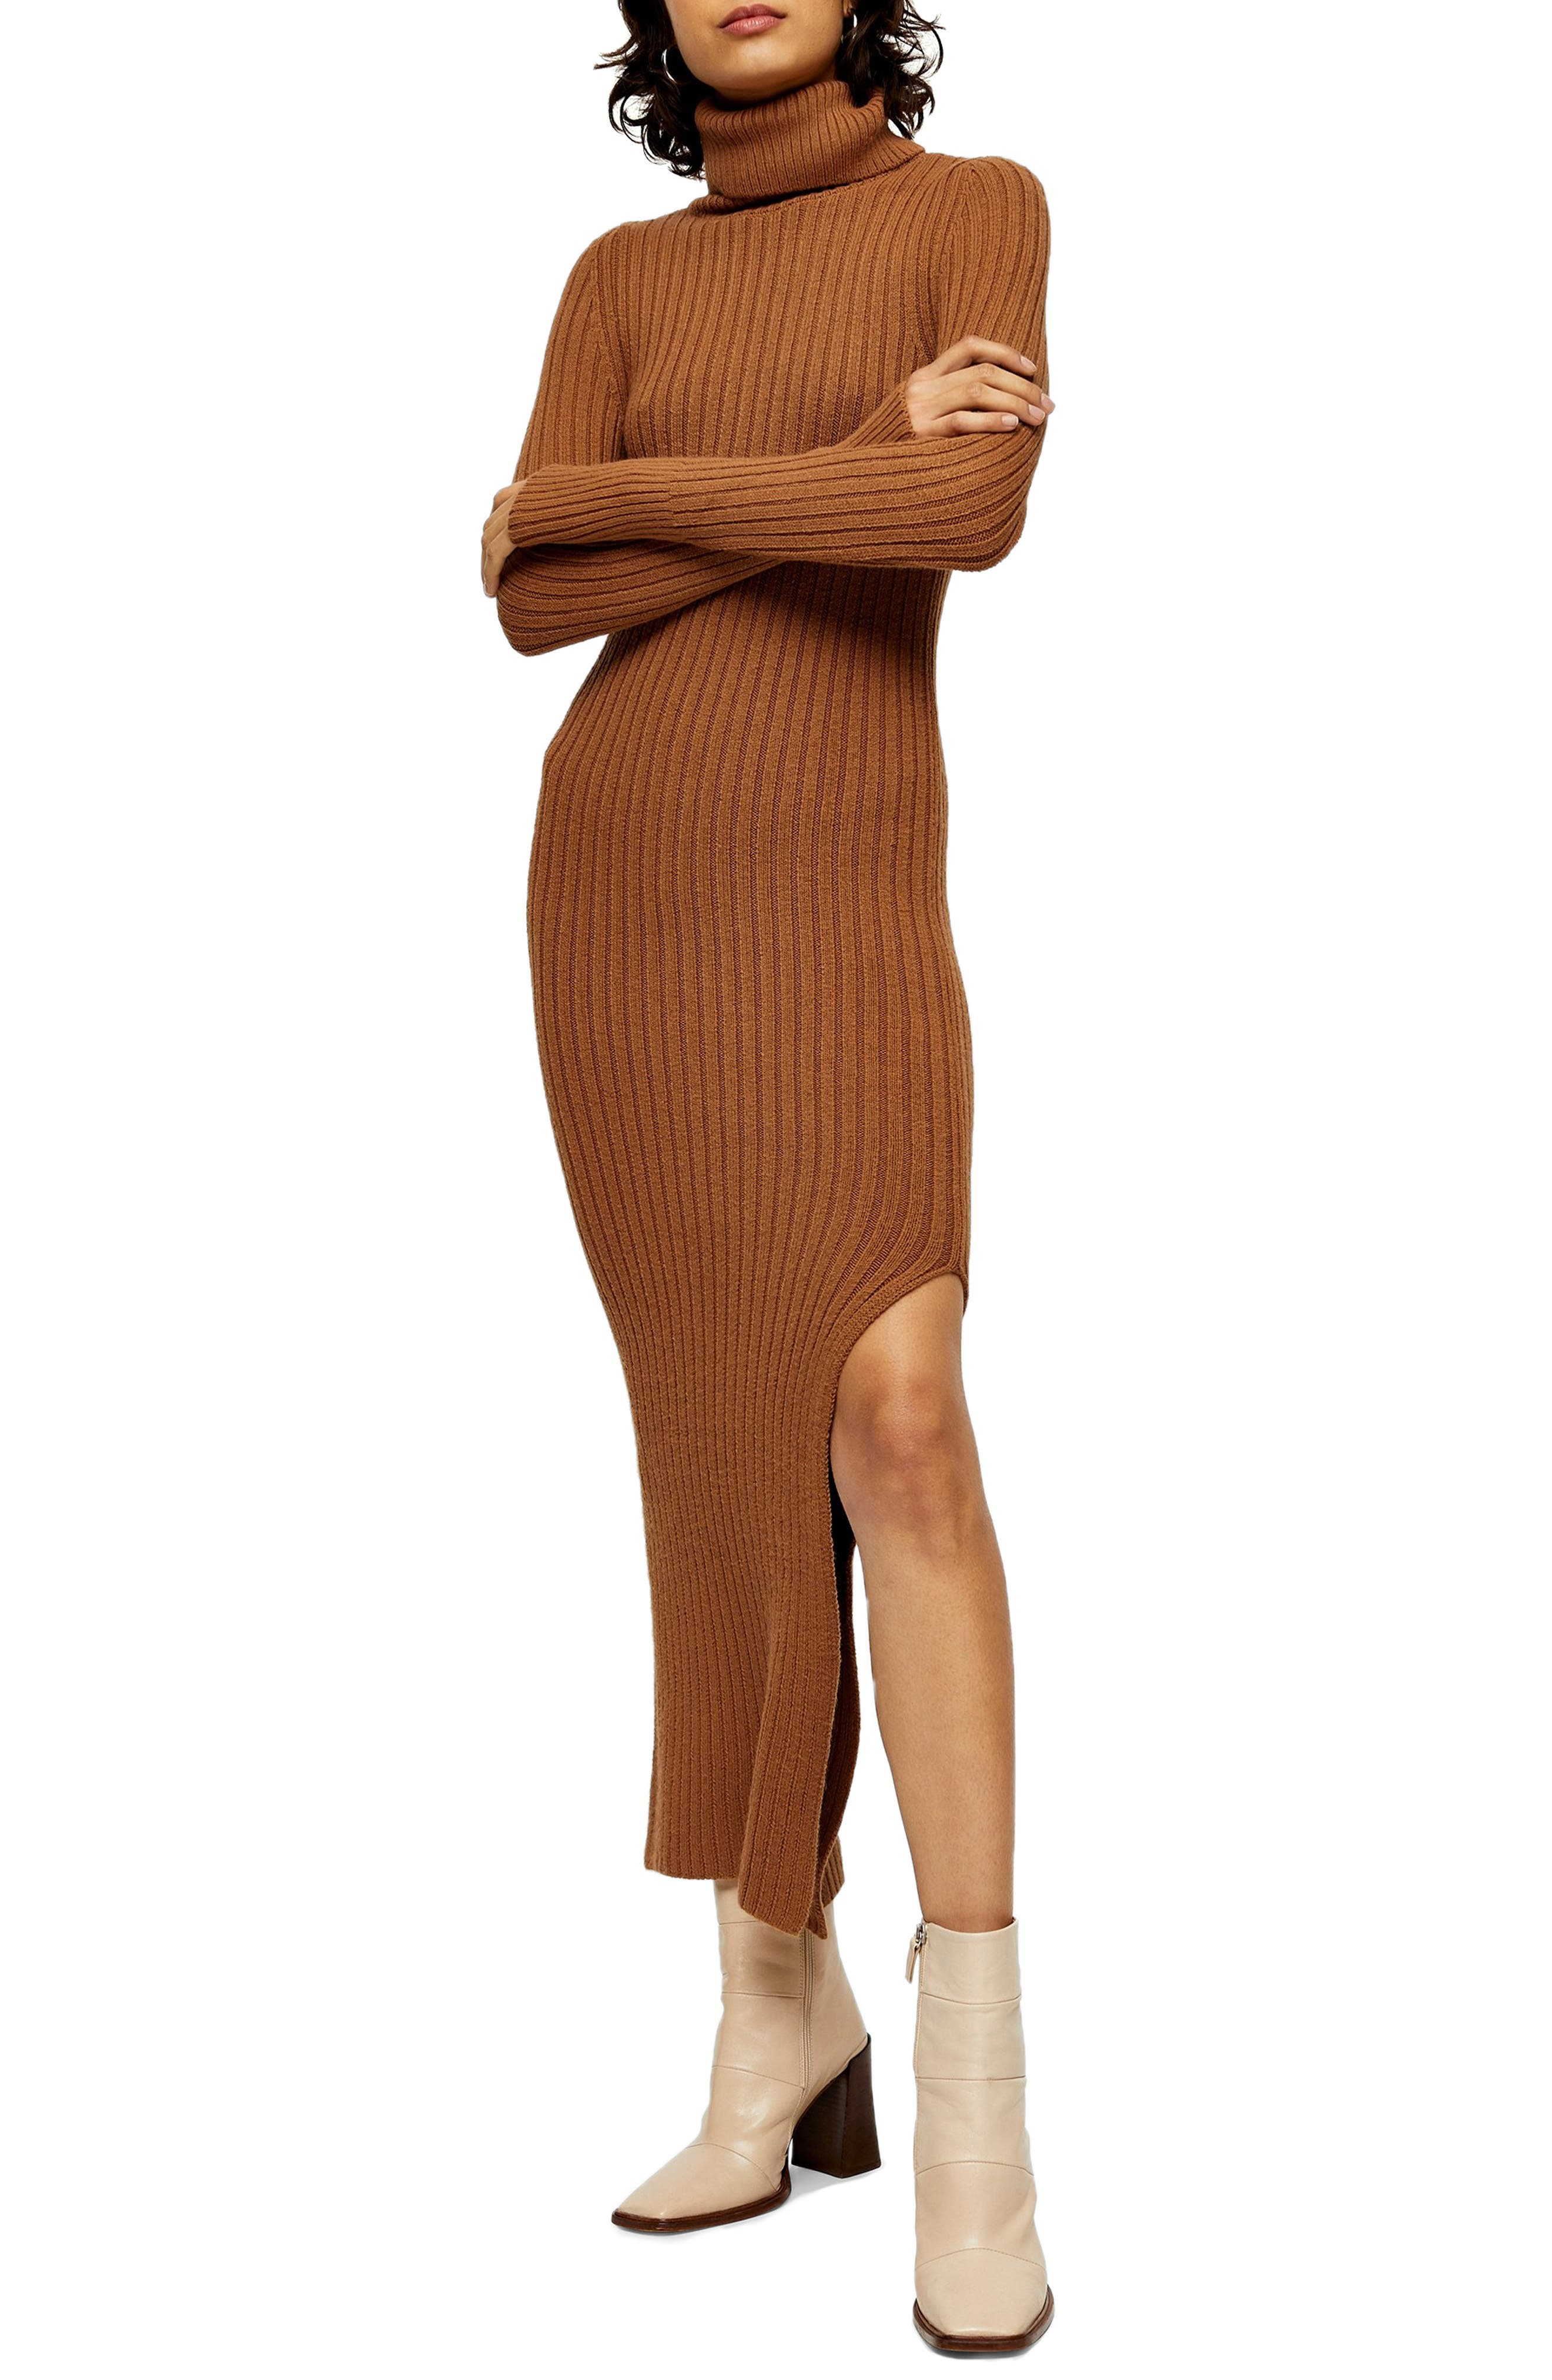 Topshop Turtleneck Long Sleeve Sweater Dress